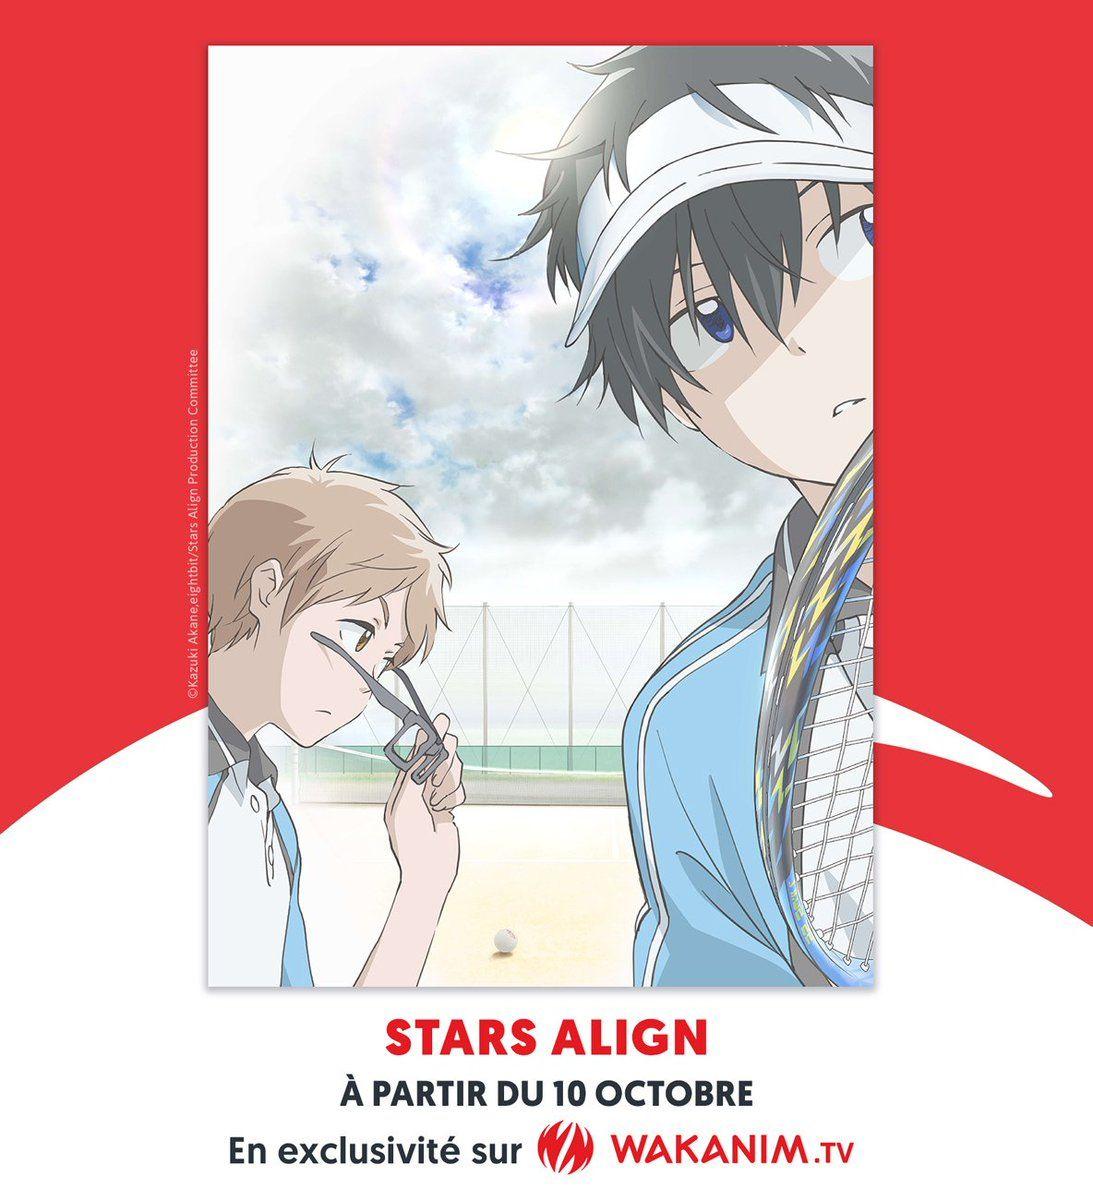 stars-align-annonce-wakanim.jpg